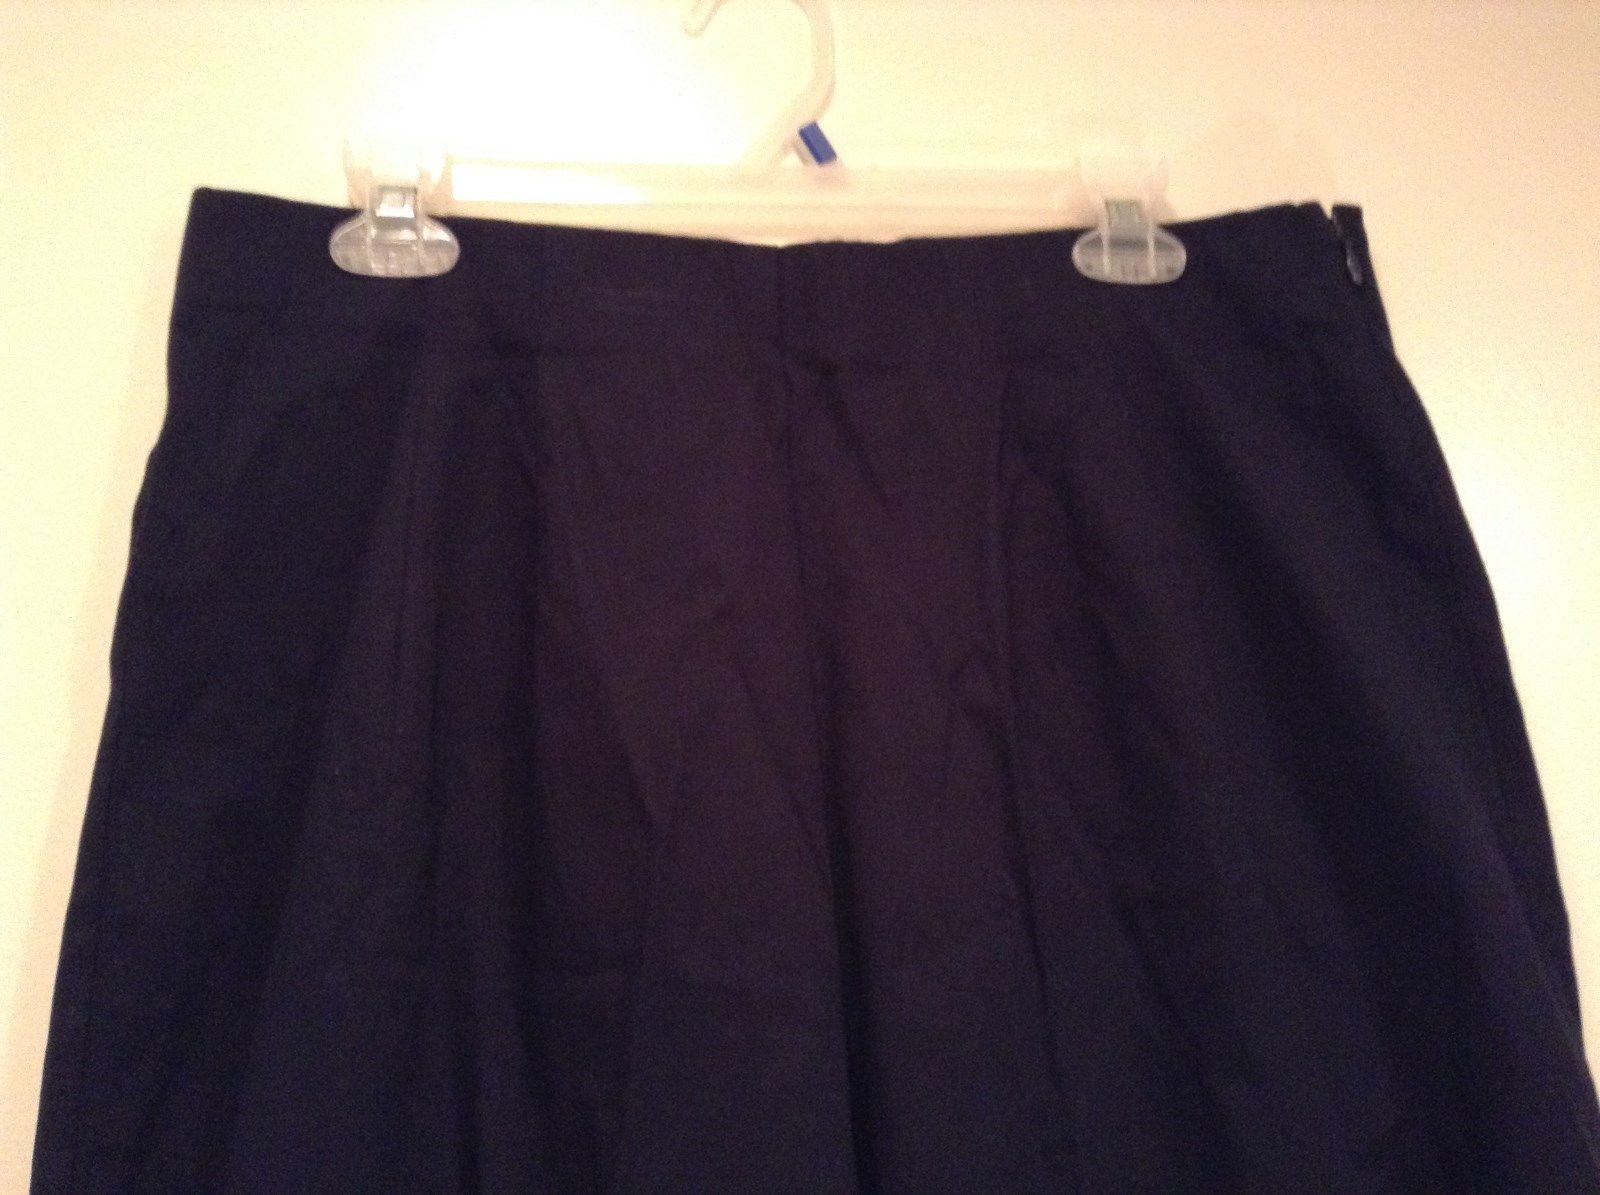 Dark Blue Briggs New York Size 16W Capri Pants Side Zipper Closure Cotton Blend